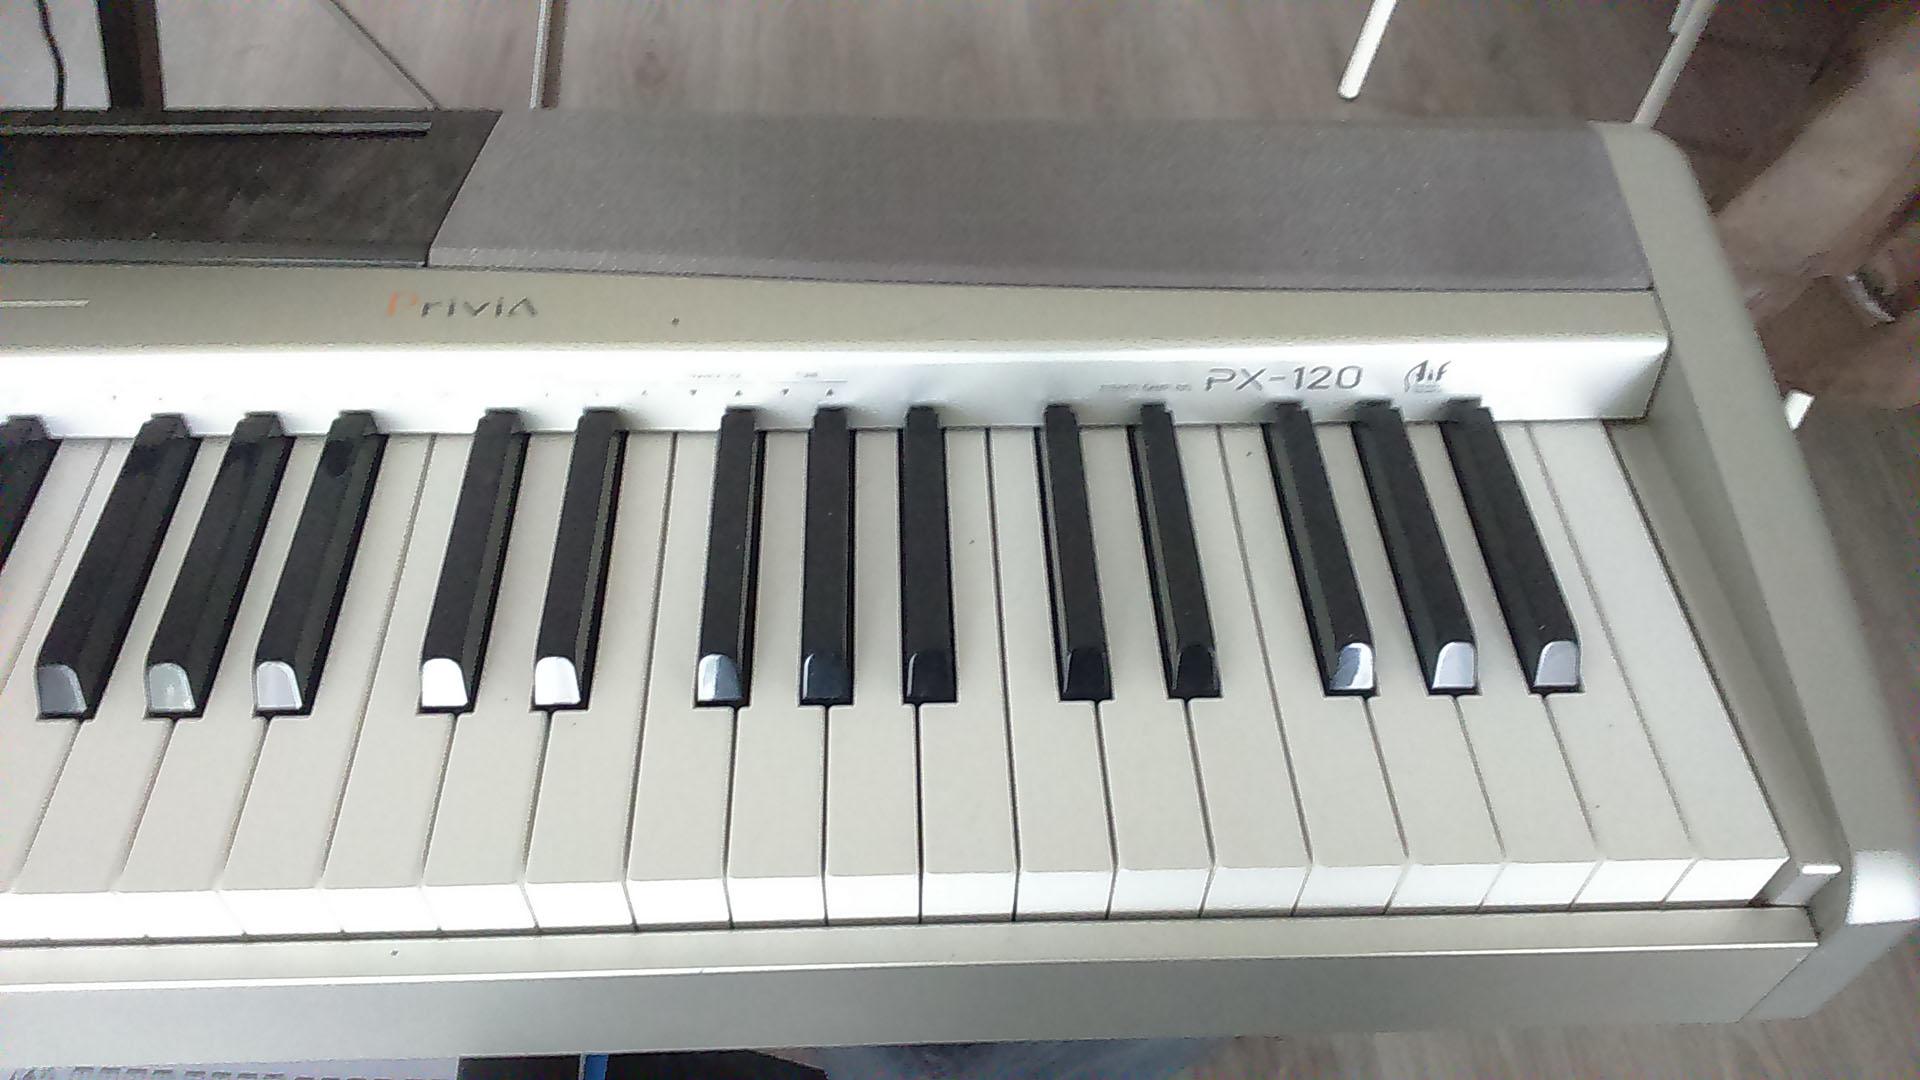 Casio px 120 image 1423788 audiofanzine for Small piano dimensions